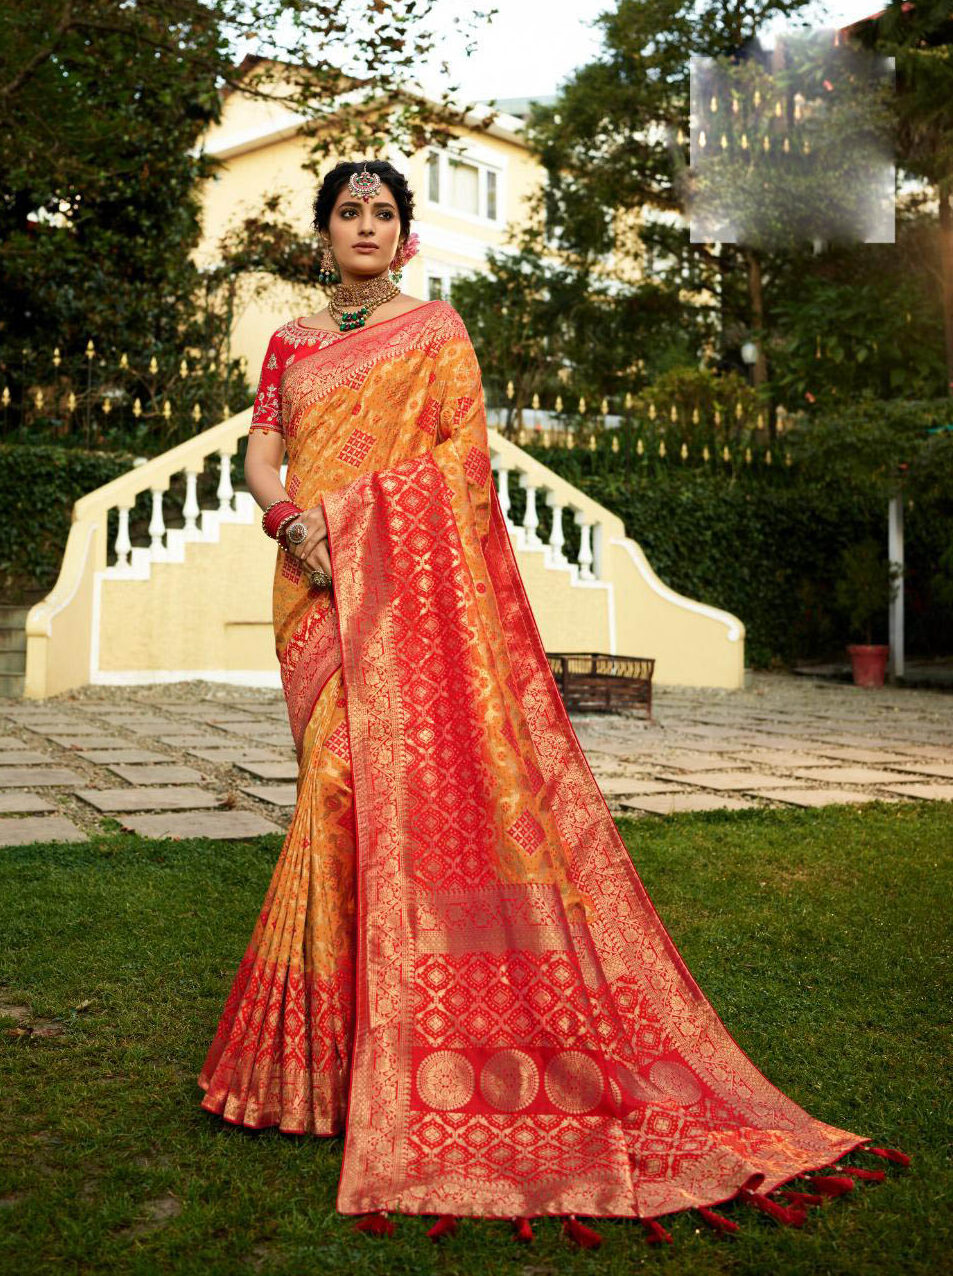 Latest Update Orange Color Banarsi Silk Saree Cost